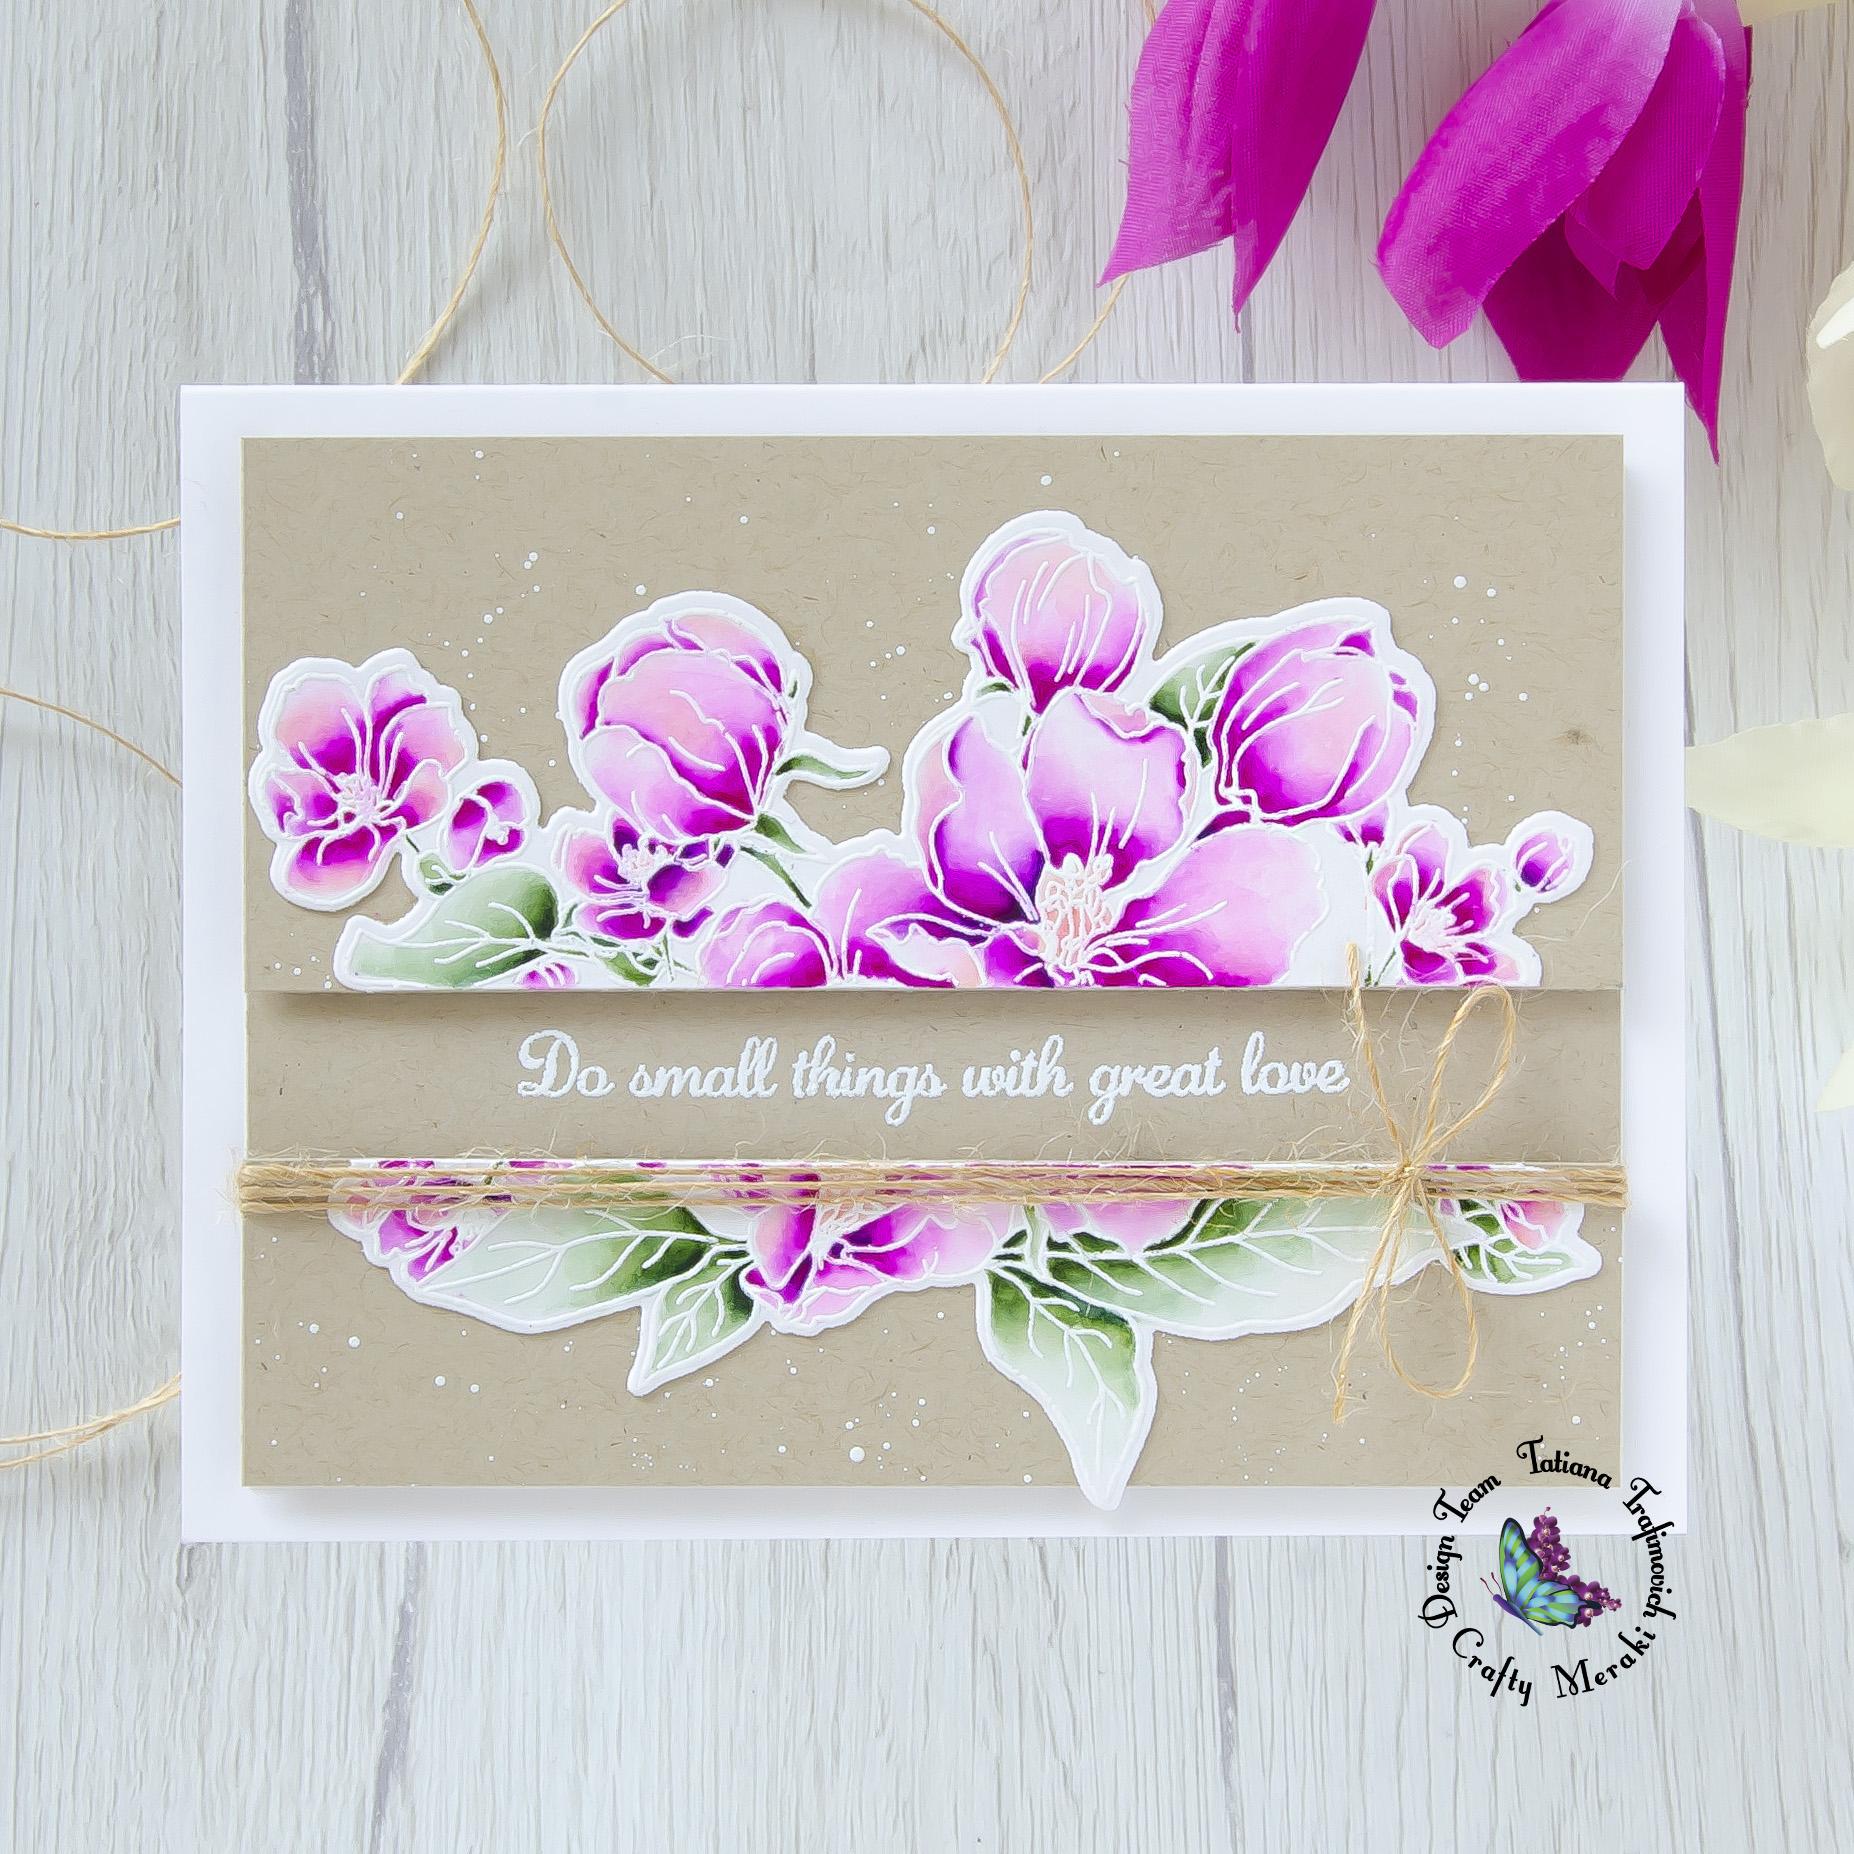 Do Small Things With Great Love #handmade card by Tatiana Trafimovich #tatianacraftandart - You Inspire Me stamp set by Crafty Meraki #craftymeraki